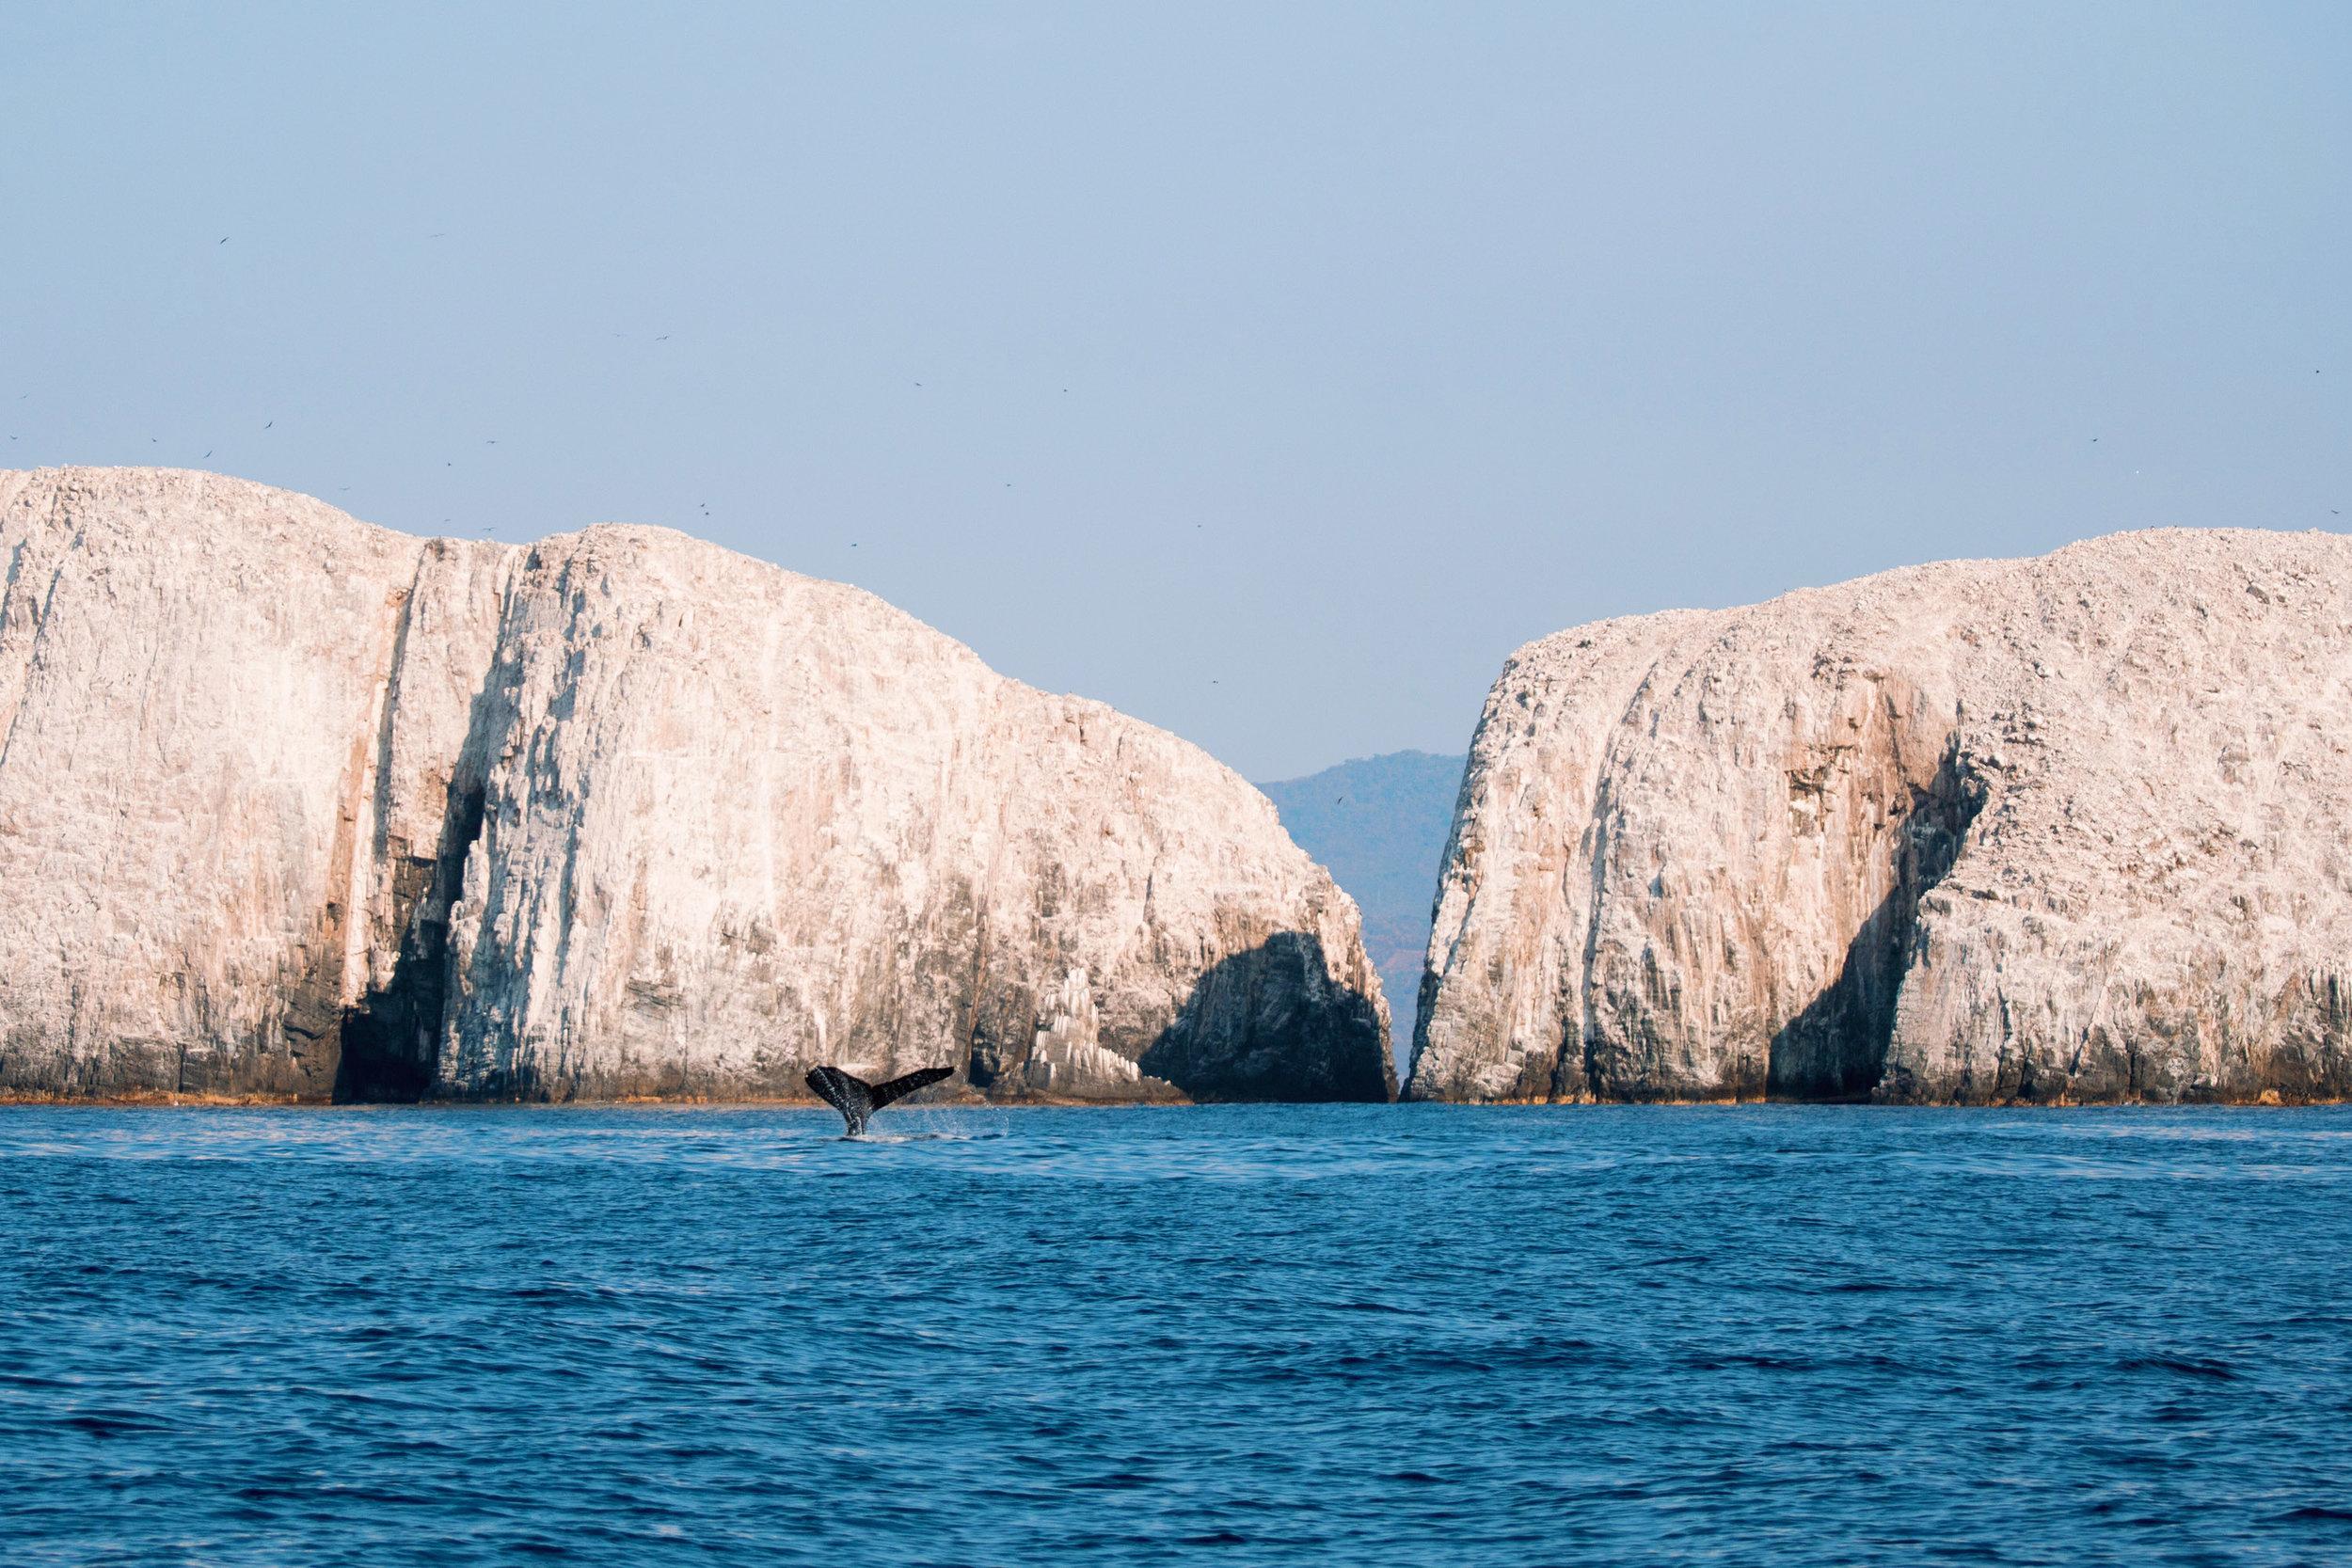 Ballenas-Ixtapa-Zihuatanejo-Fotografia-Heiko-Bothe-1.JPG